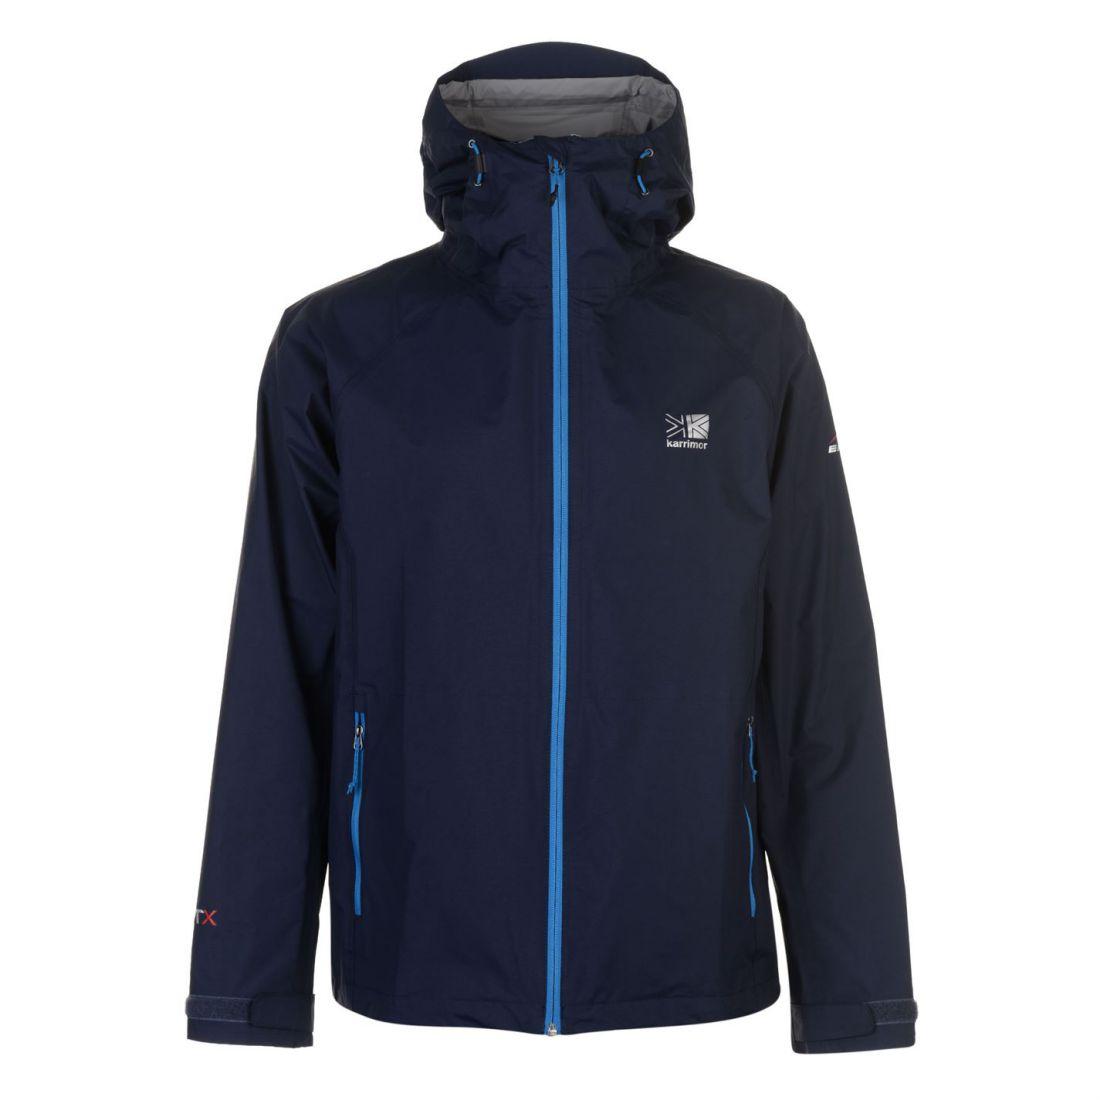 Karrimor Mens Helium 2.5L Jacket Waterproof Coat Top